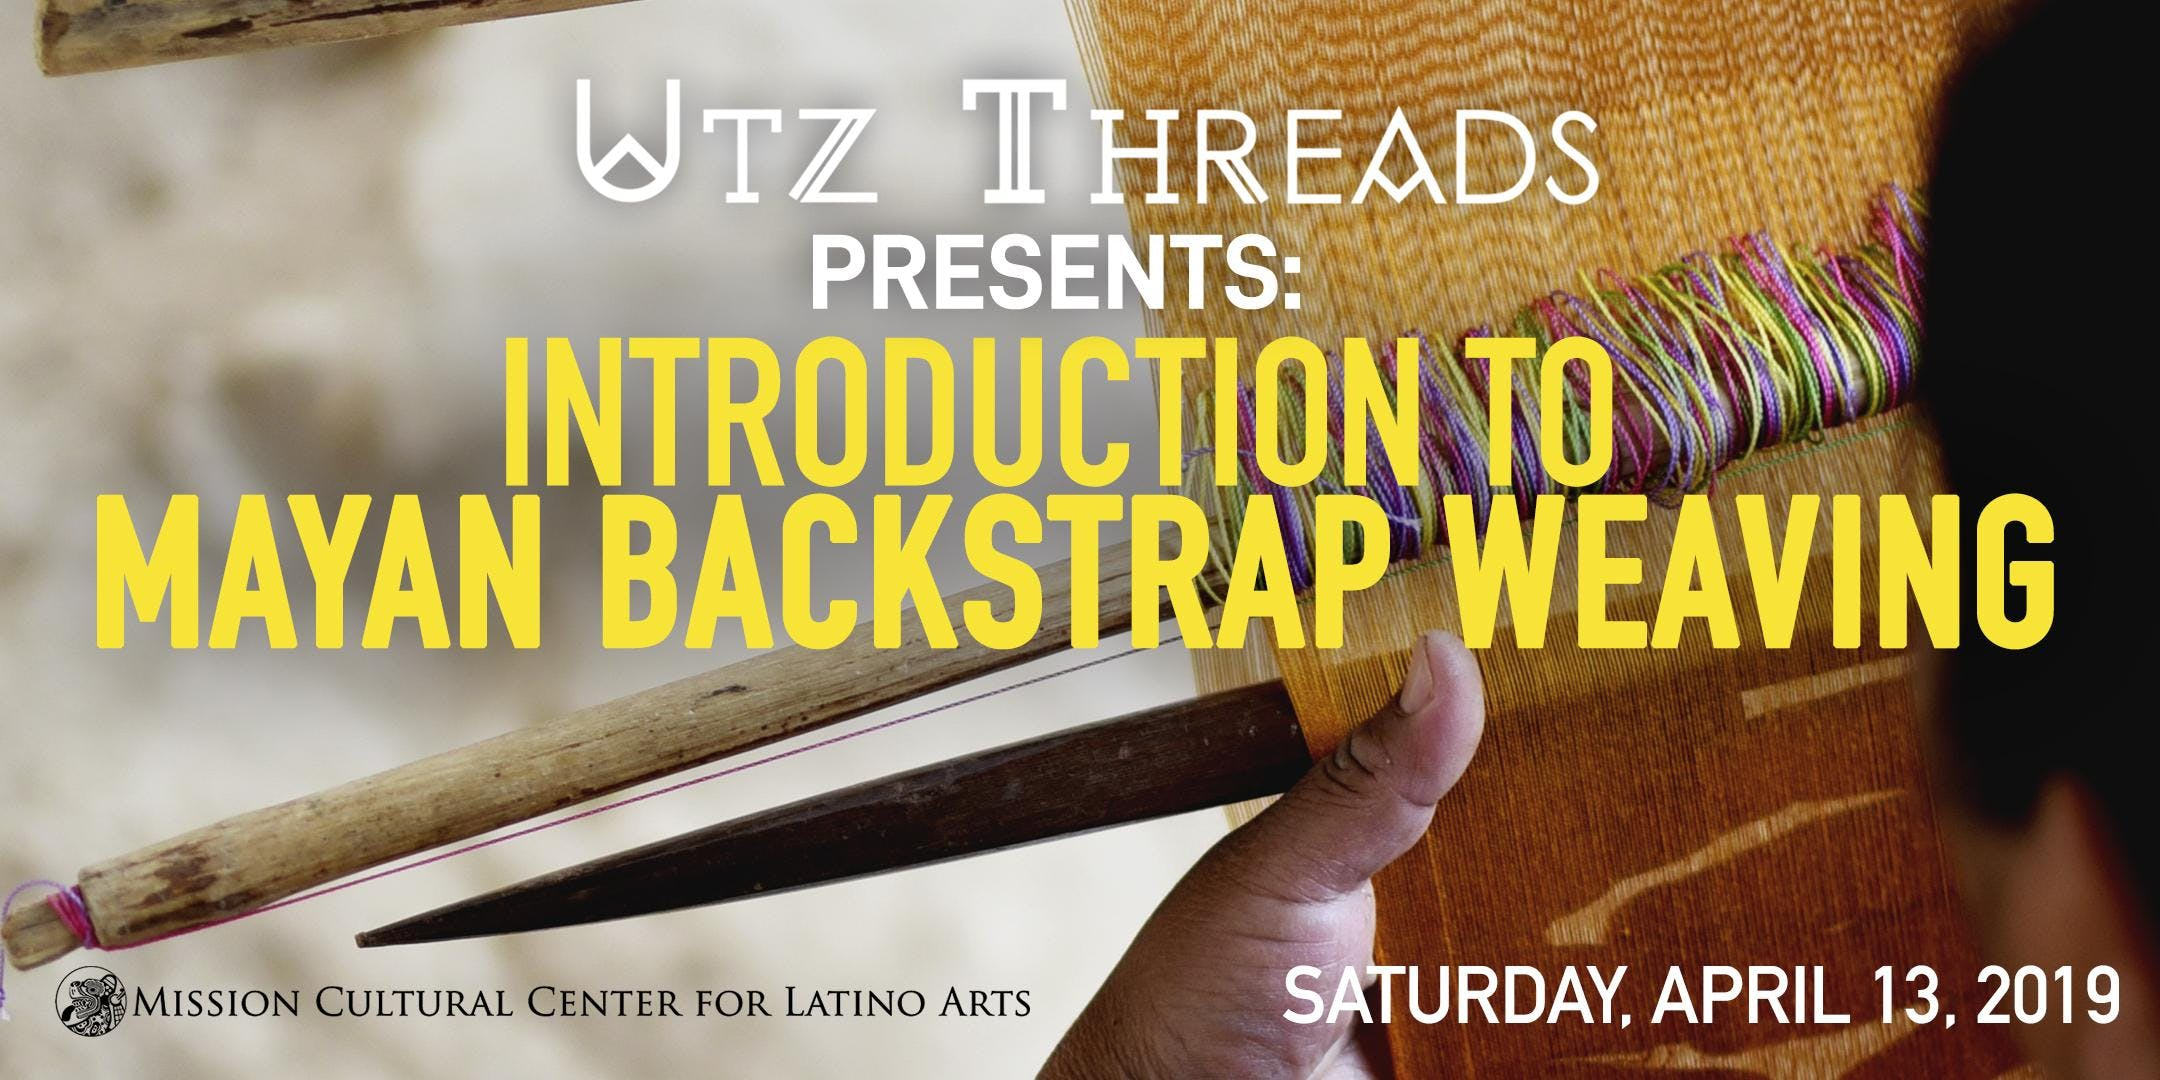 Utz Threads Presents: Introduction to Mayan B